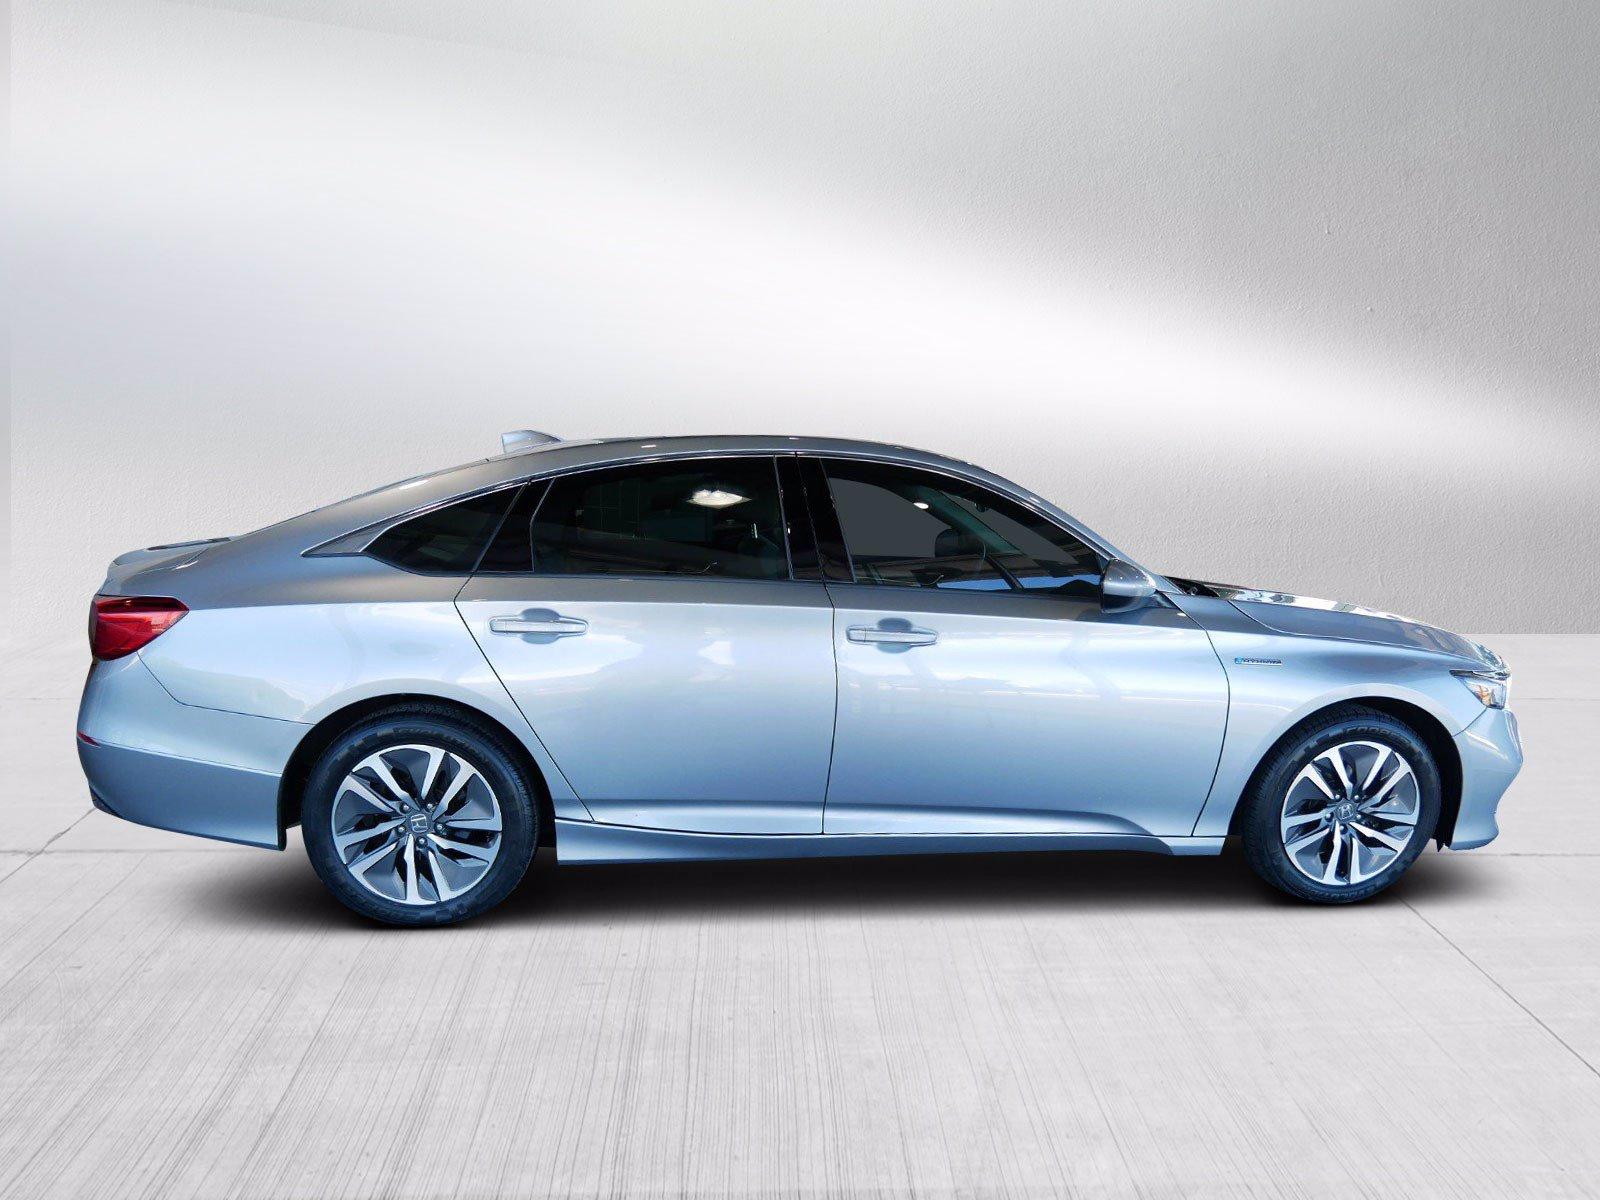 Used 2018 Honda Accord Hybrid with VIN 1HGCV3F17JA005645 for sale in Bloomington, Minnesota